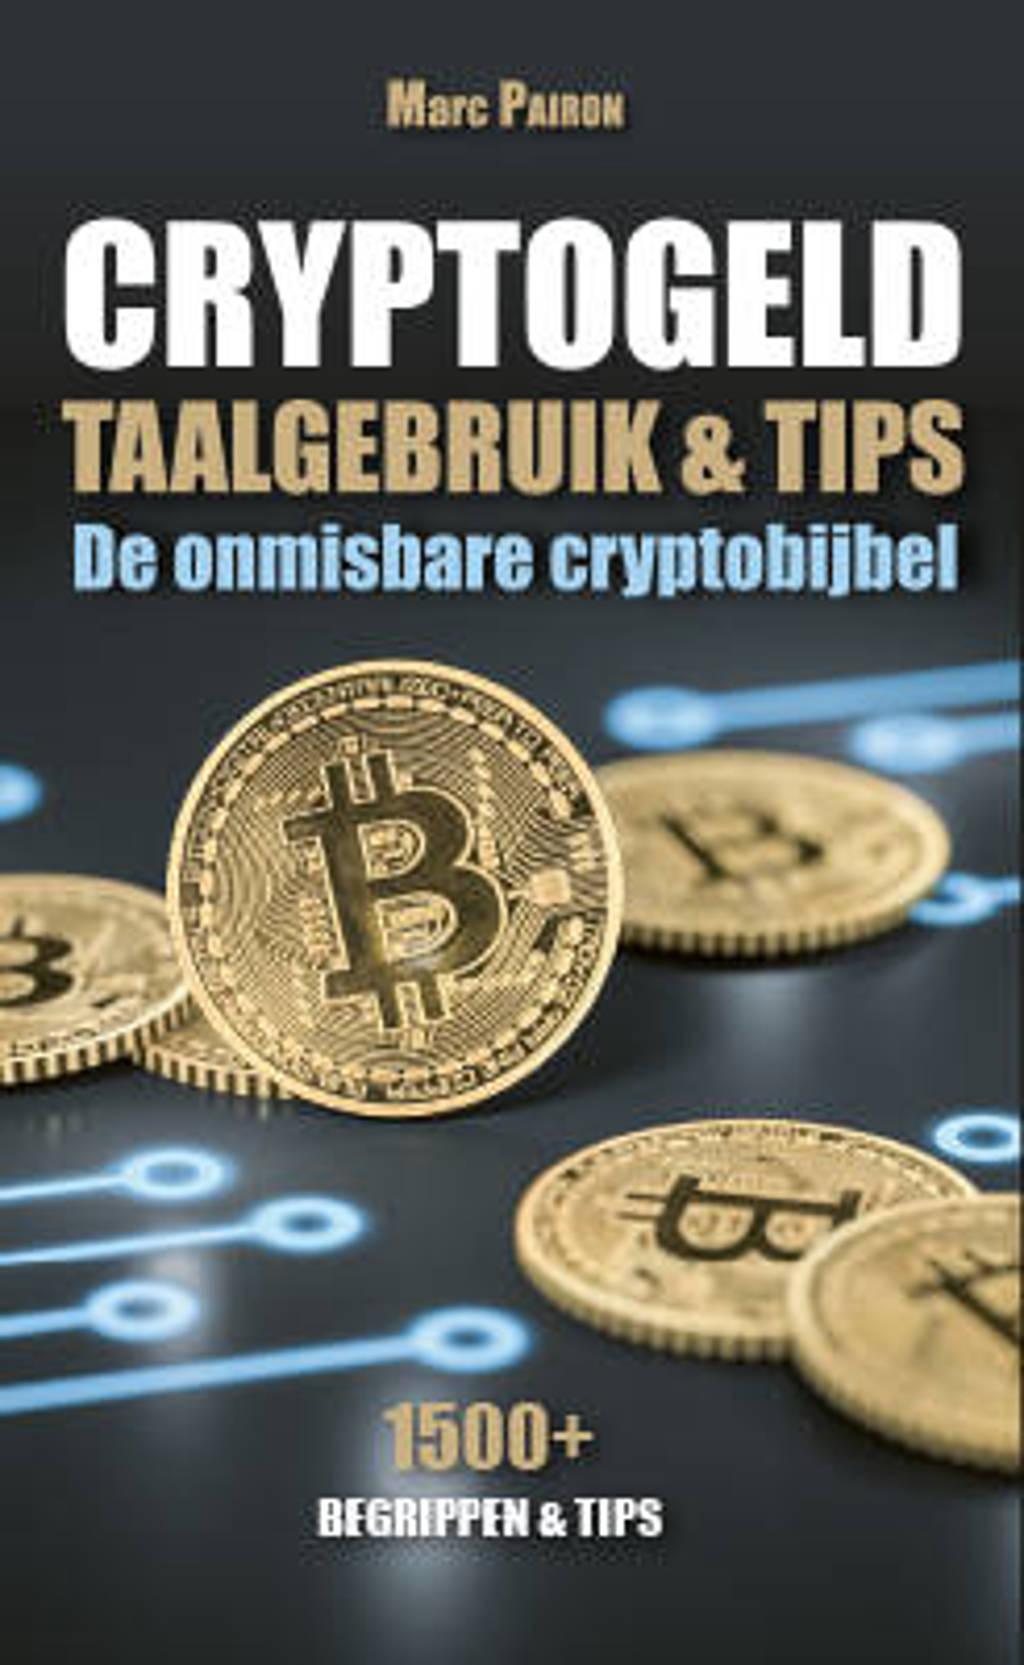 Cryptogeld - Marc Pairon